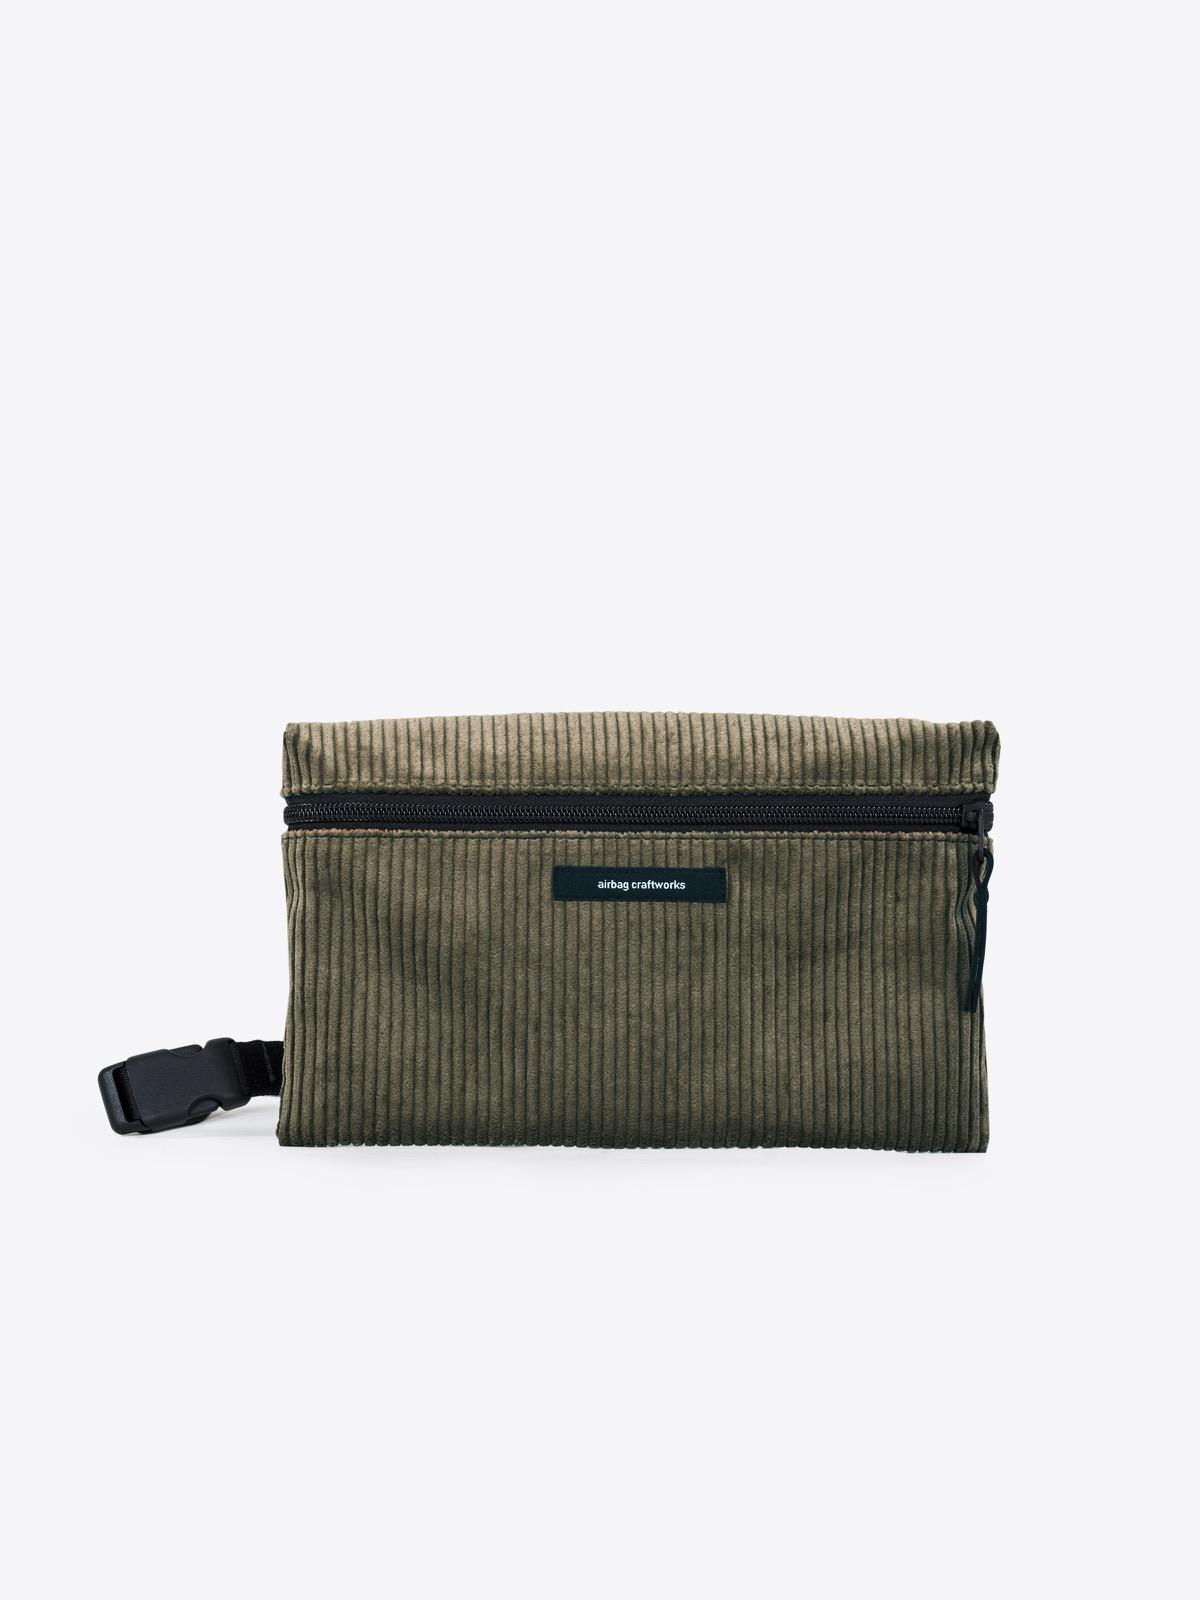 airbag craftworks corduroy | olive